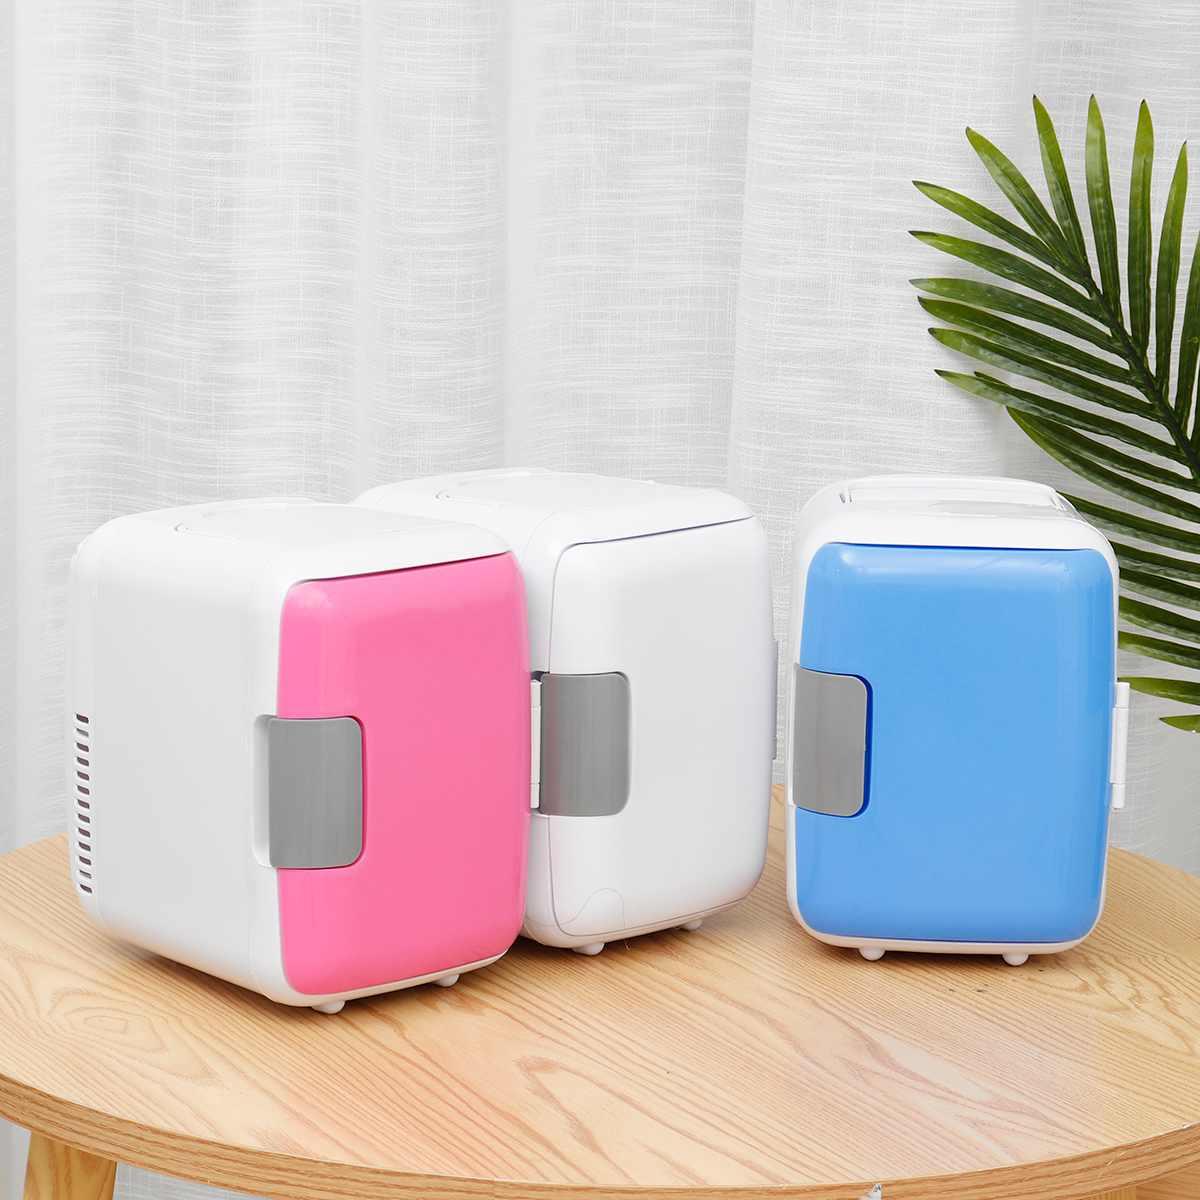 Car Refrigerator Mini Fridge For Cosmetic 12V Small Refrigerador Car Refrigerator Mini Coolers For Car Refrigerators